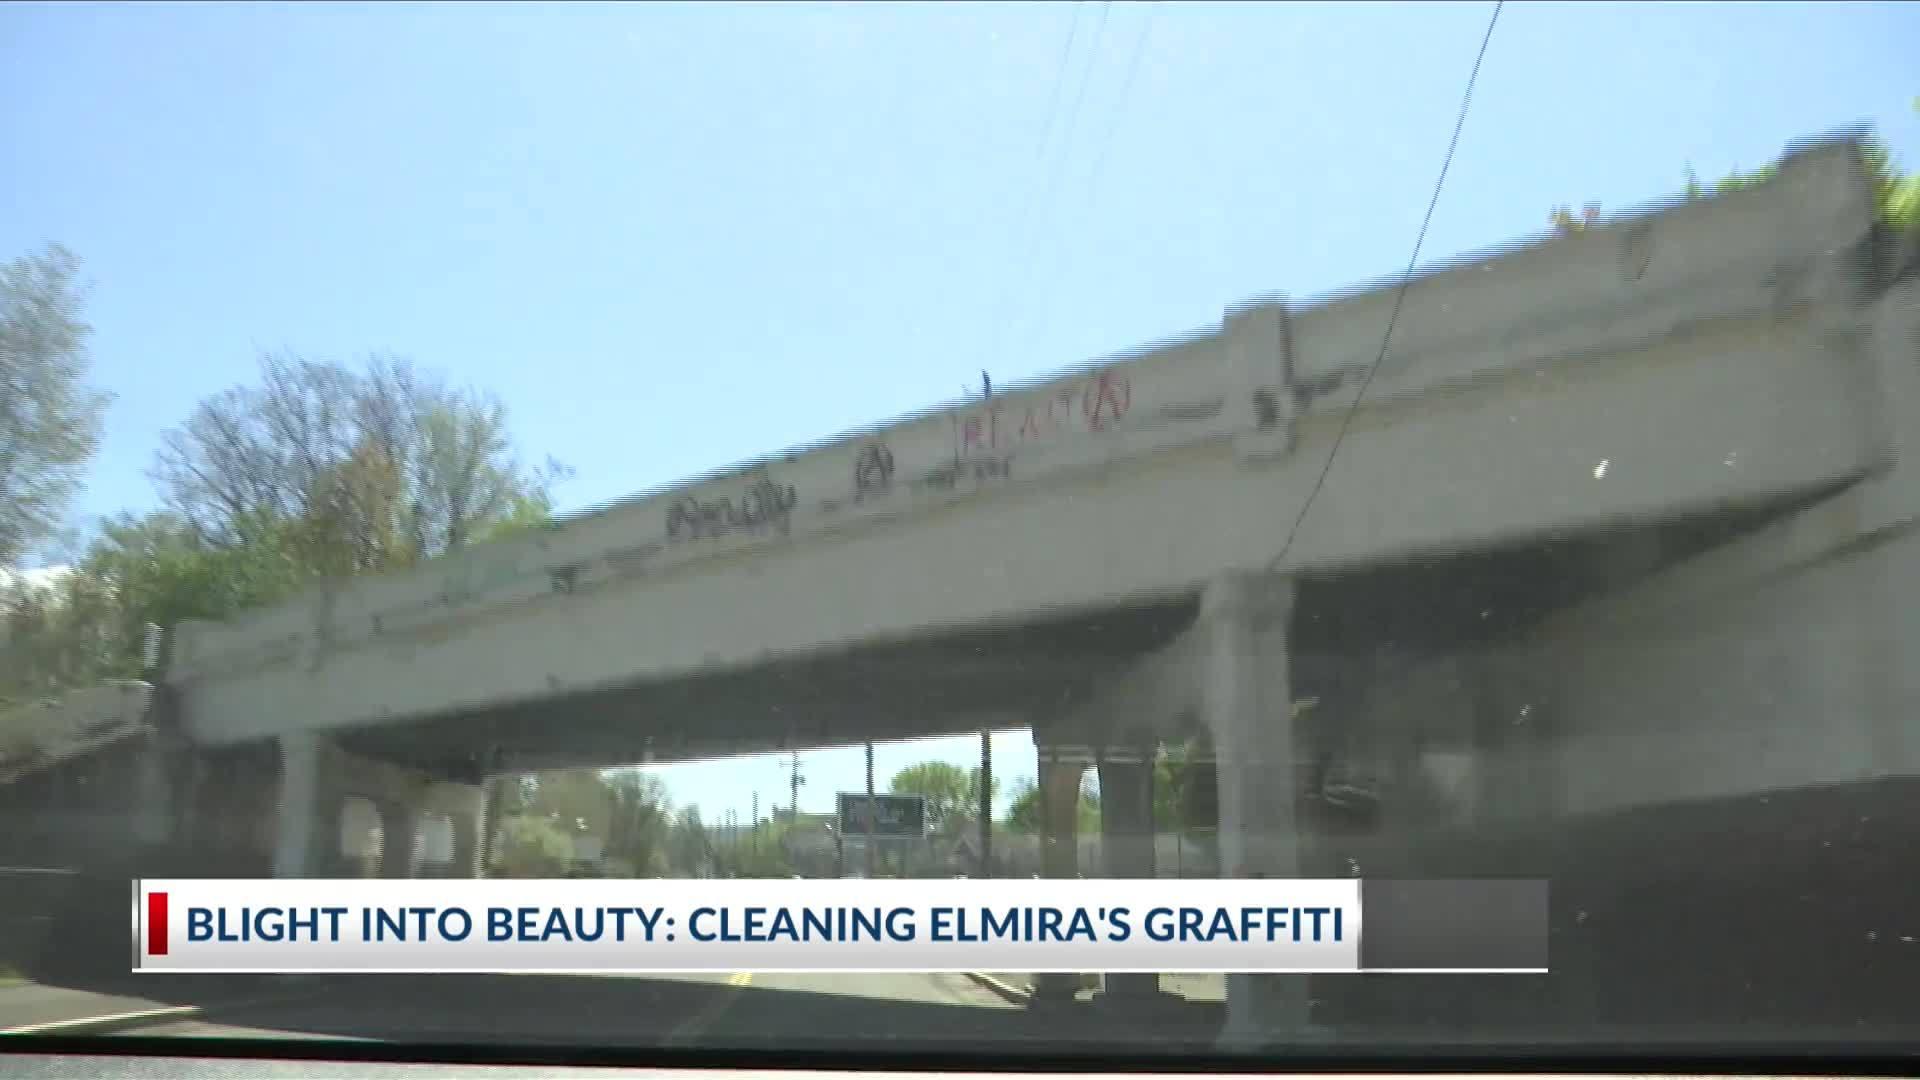 Cleaning_Elmira_s_graffiti_6_20190514213942